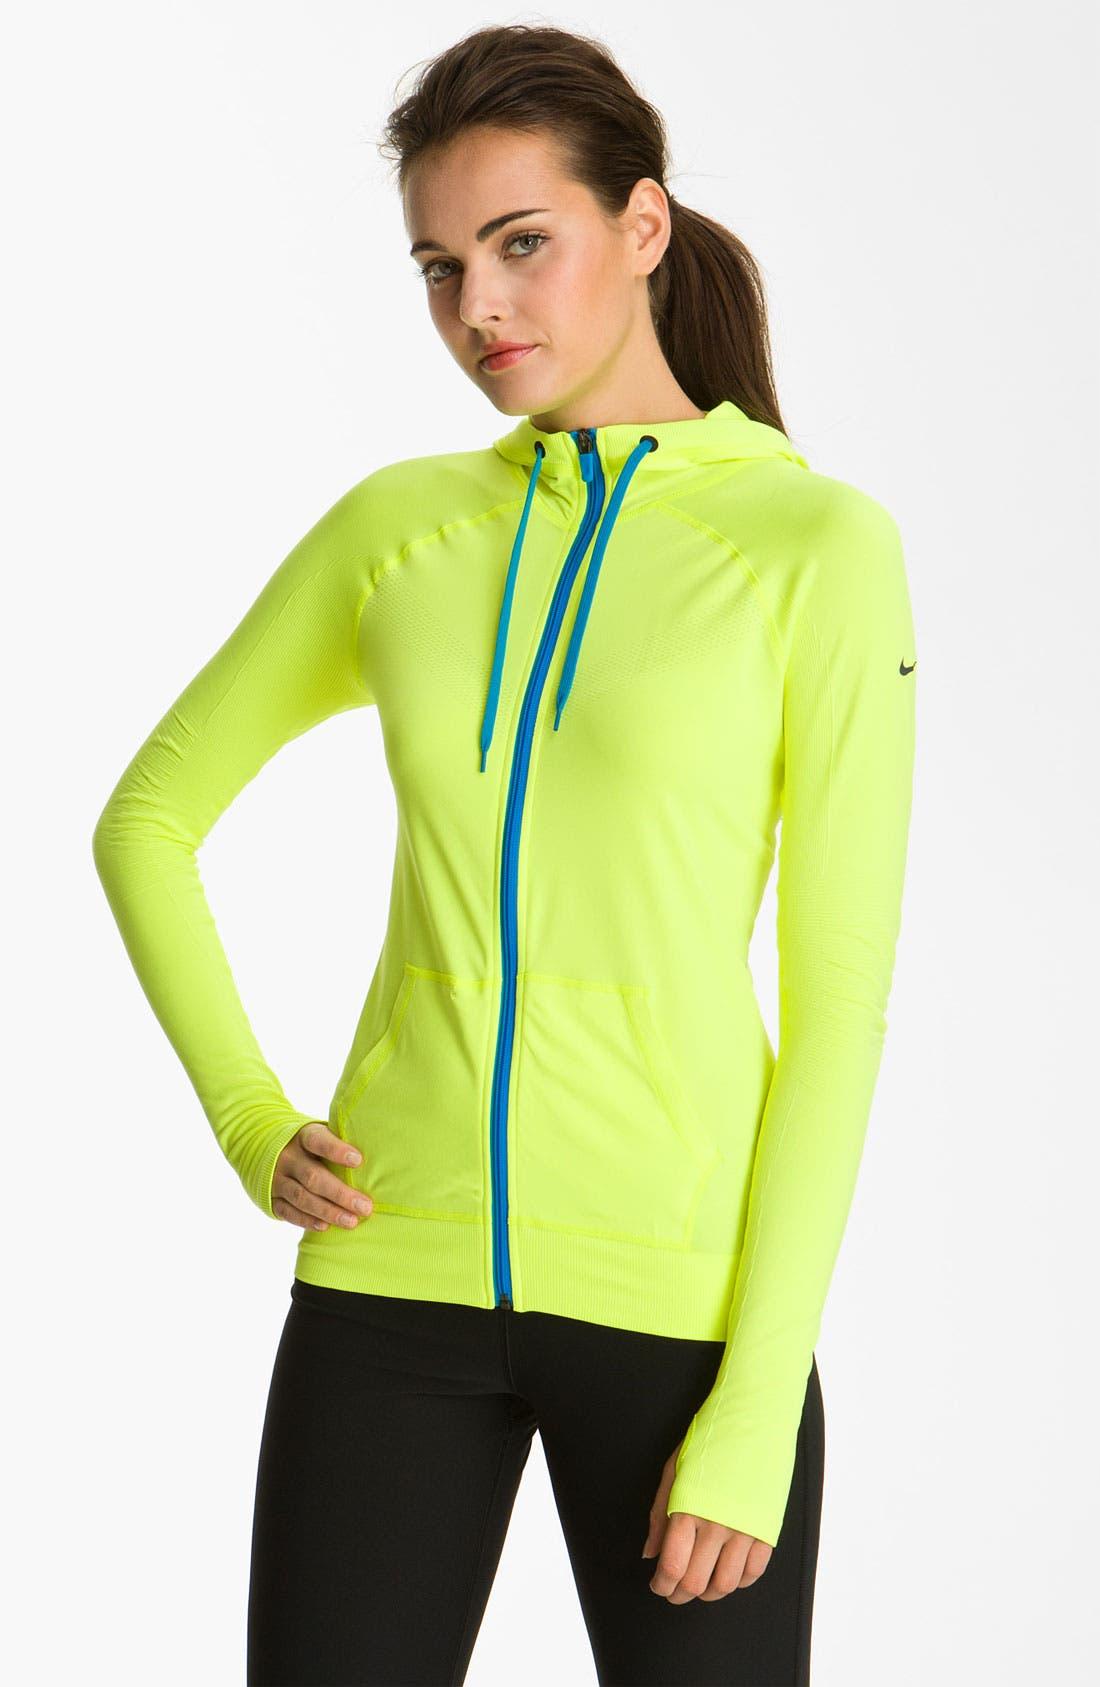 Alternate Image 1 Selected - Nike 'Limitless' Jacket